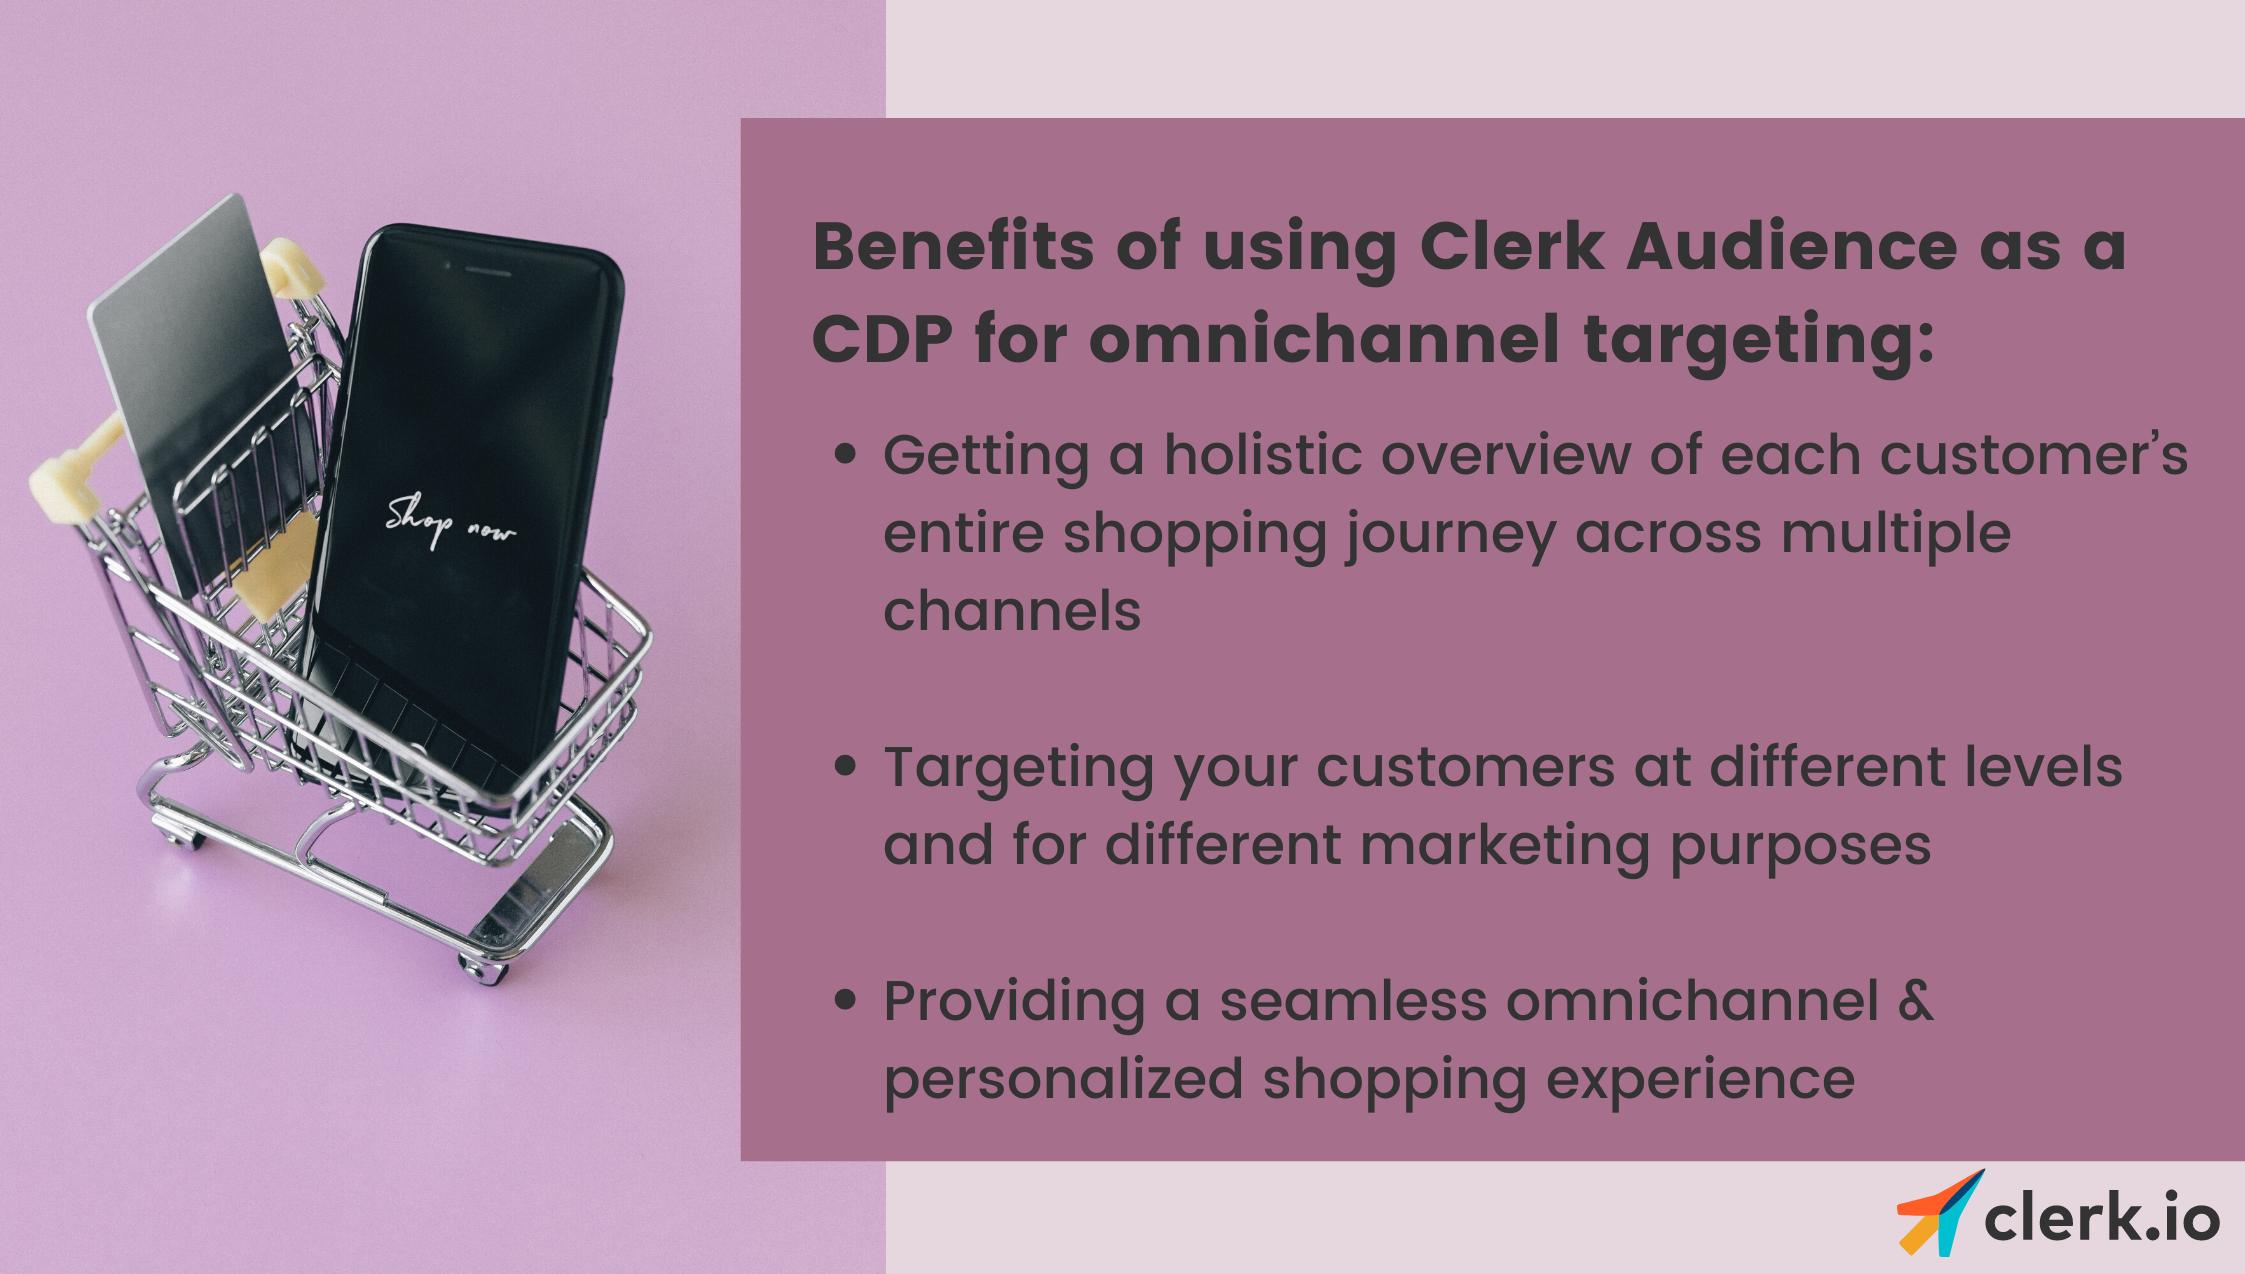 Benefits of using Clerk Audience